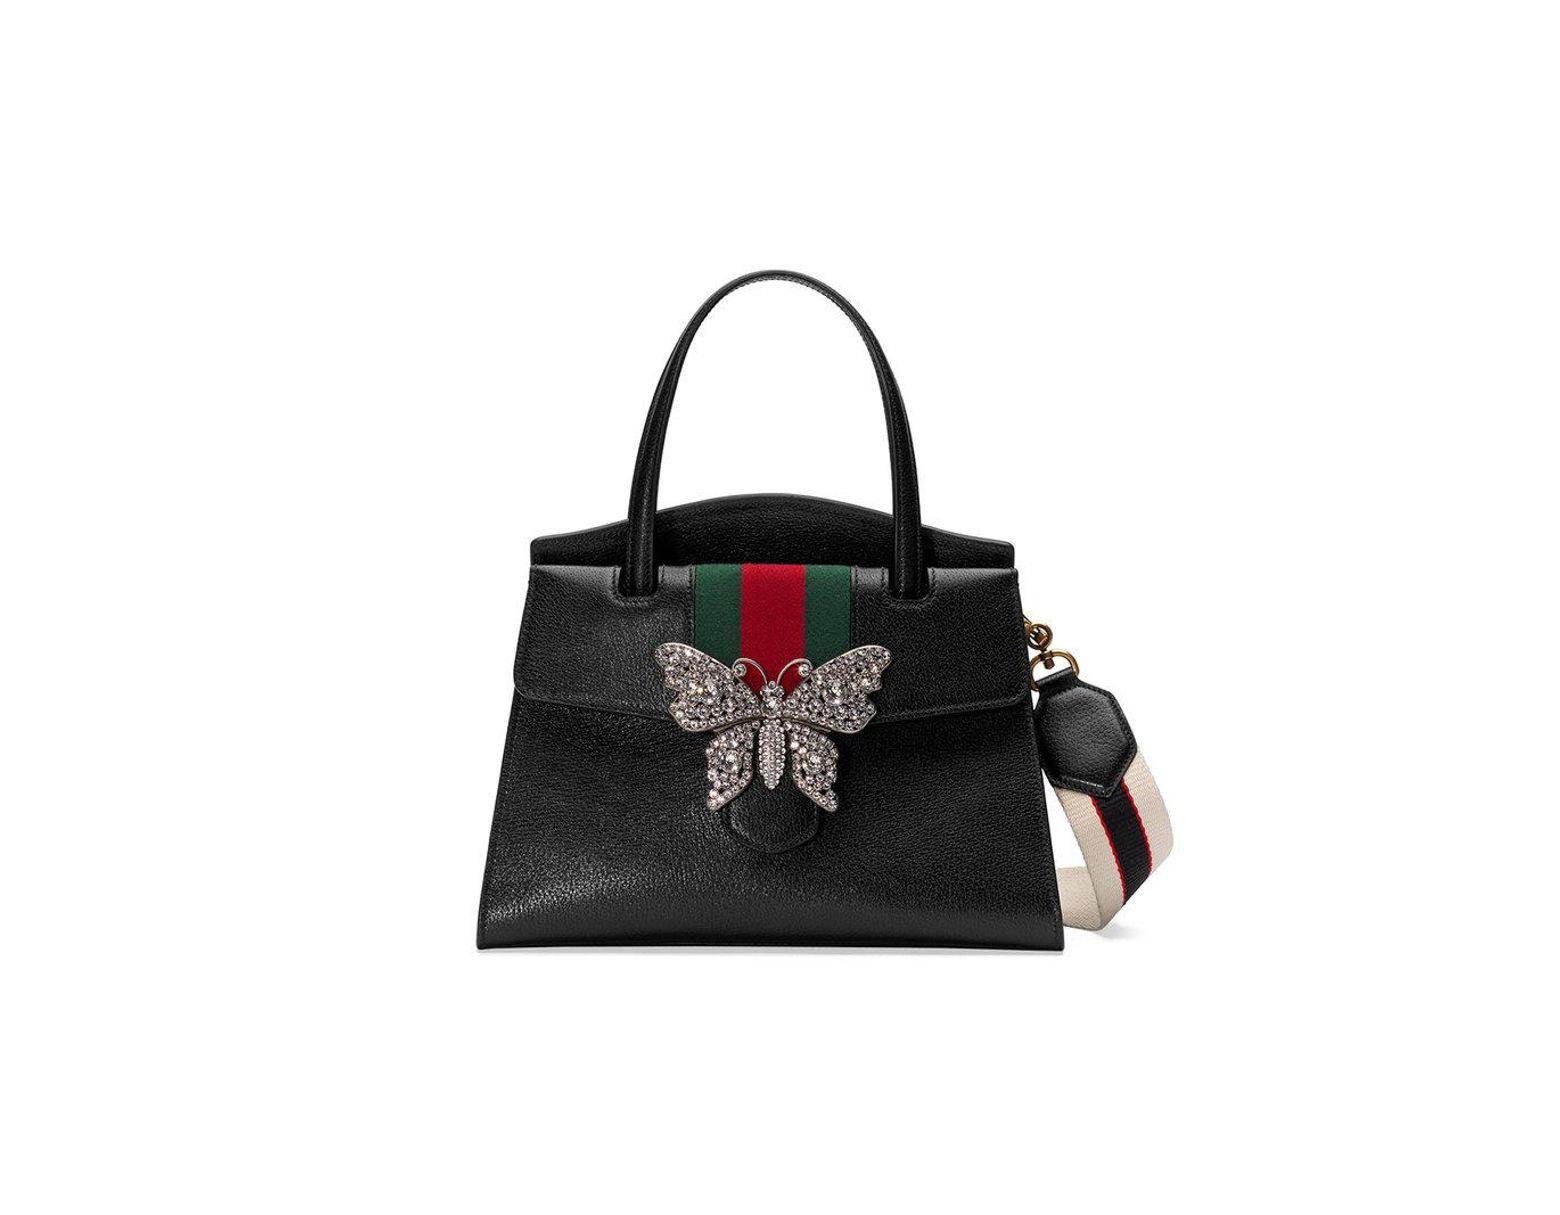 feb2259dab21 Gucci Totem Medium Top Handle Bag in Black - Lyst